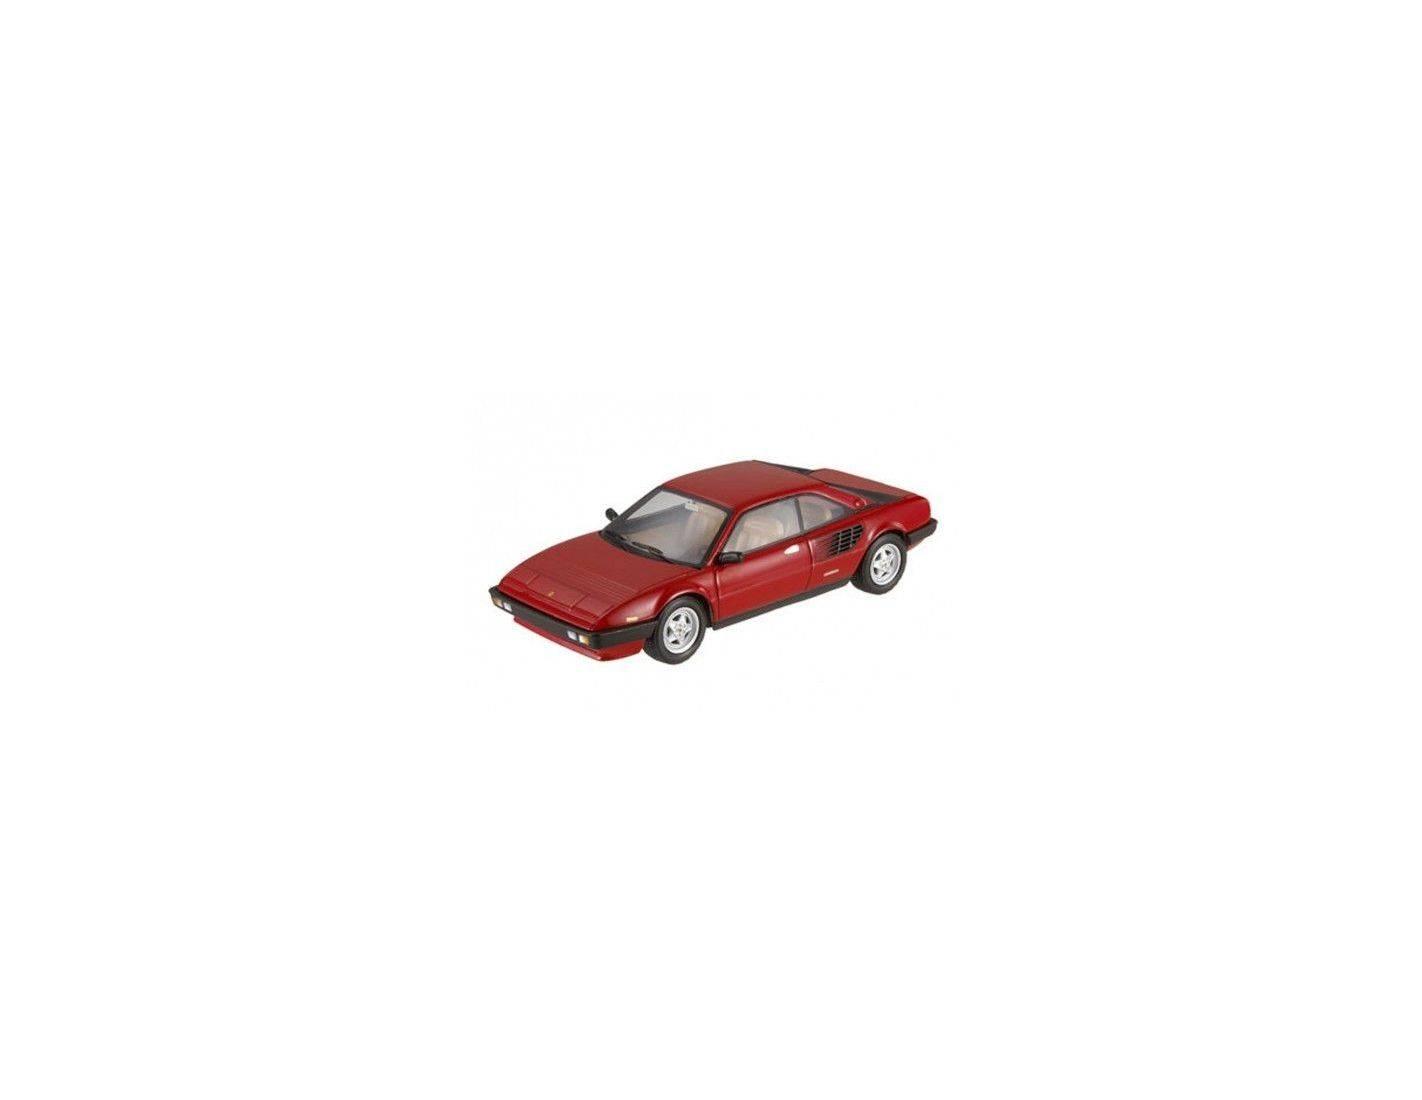 auto 1 43 mattel v8381 ferrari mondial 8 red 1 43 modellino modellino shop. Black Bedroom Furniture Sets. Home Design Ideas